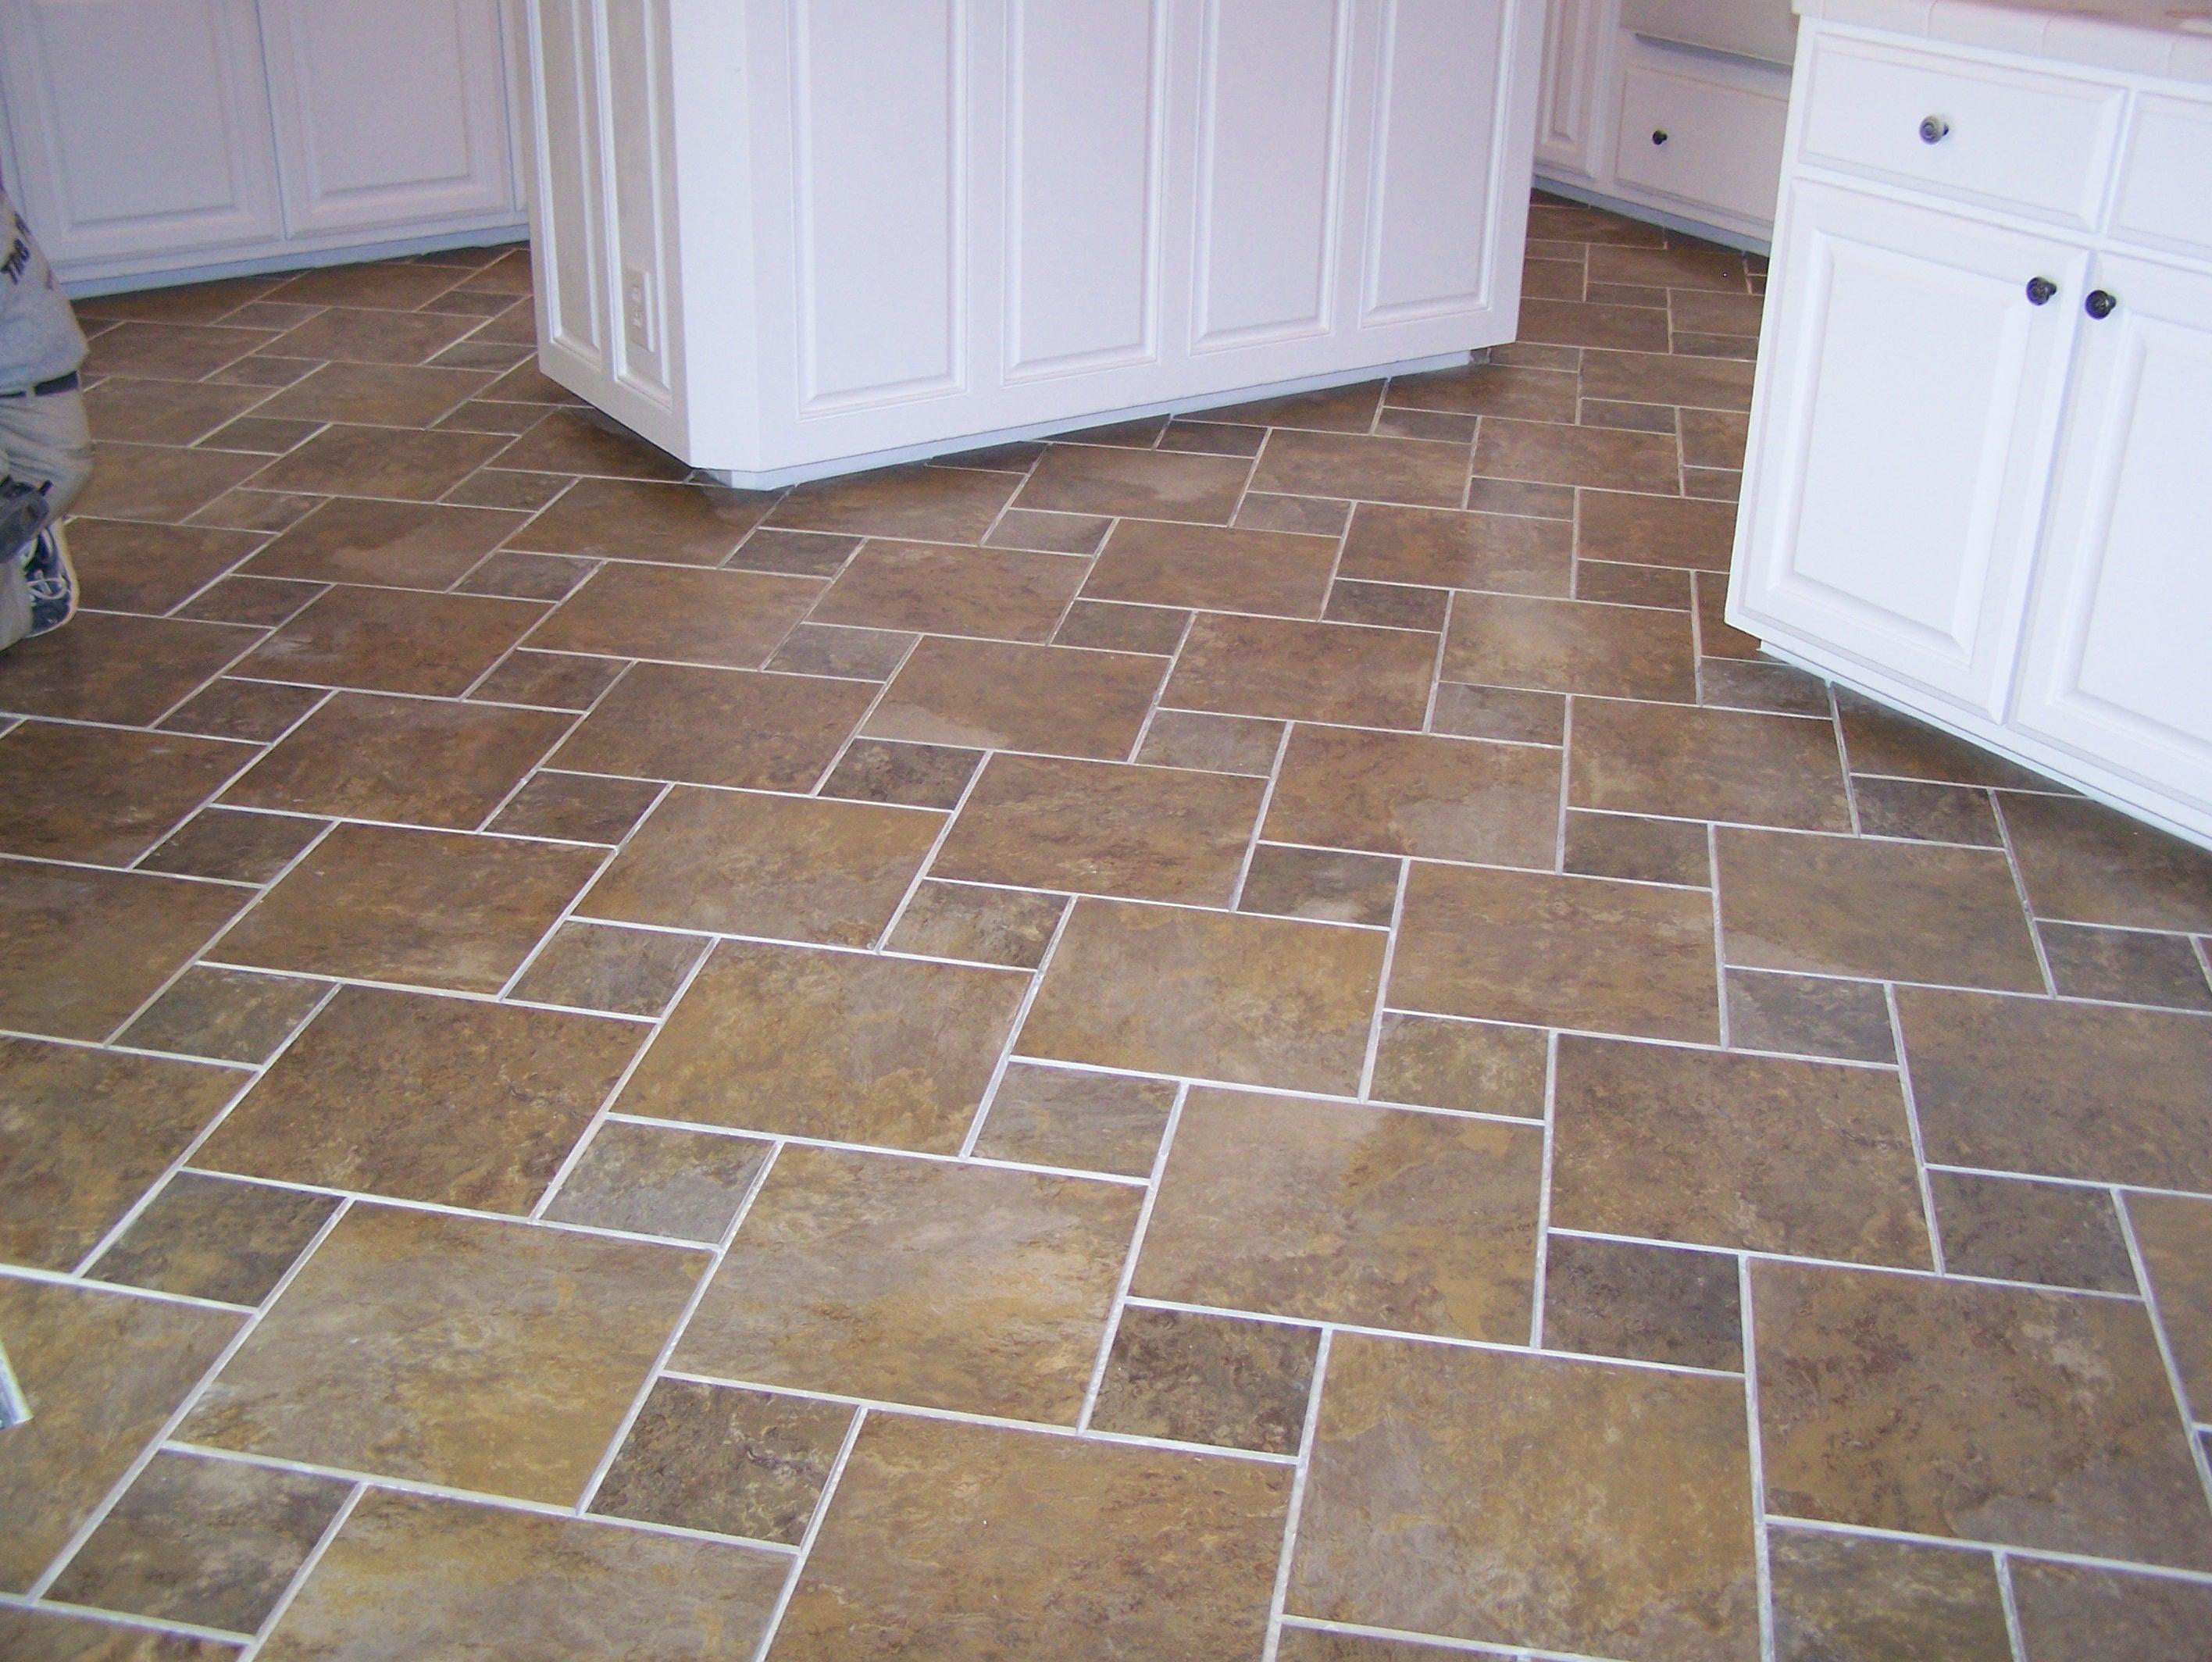 Tile and Wood Floor Layouts | Discount Flooring Blog